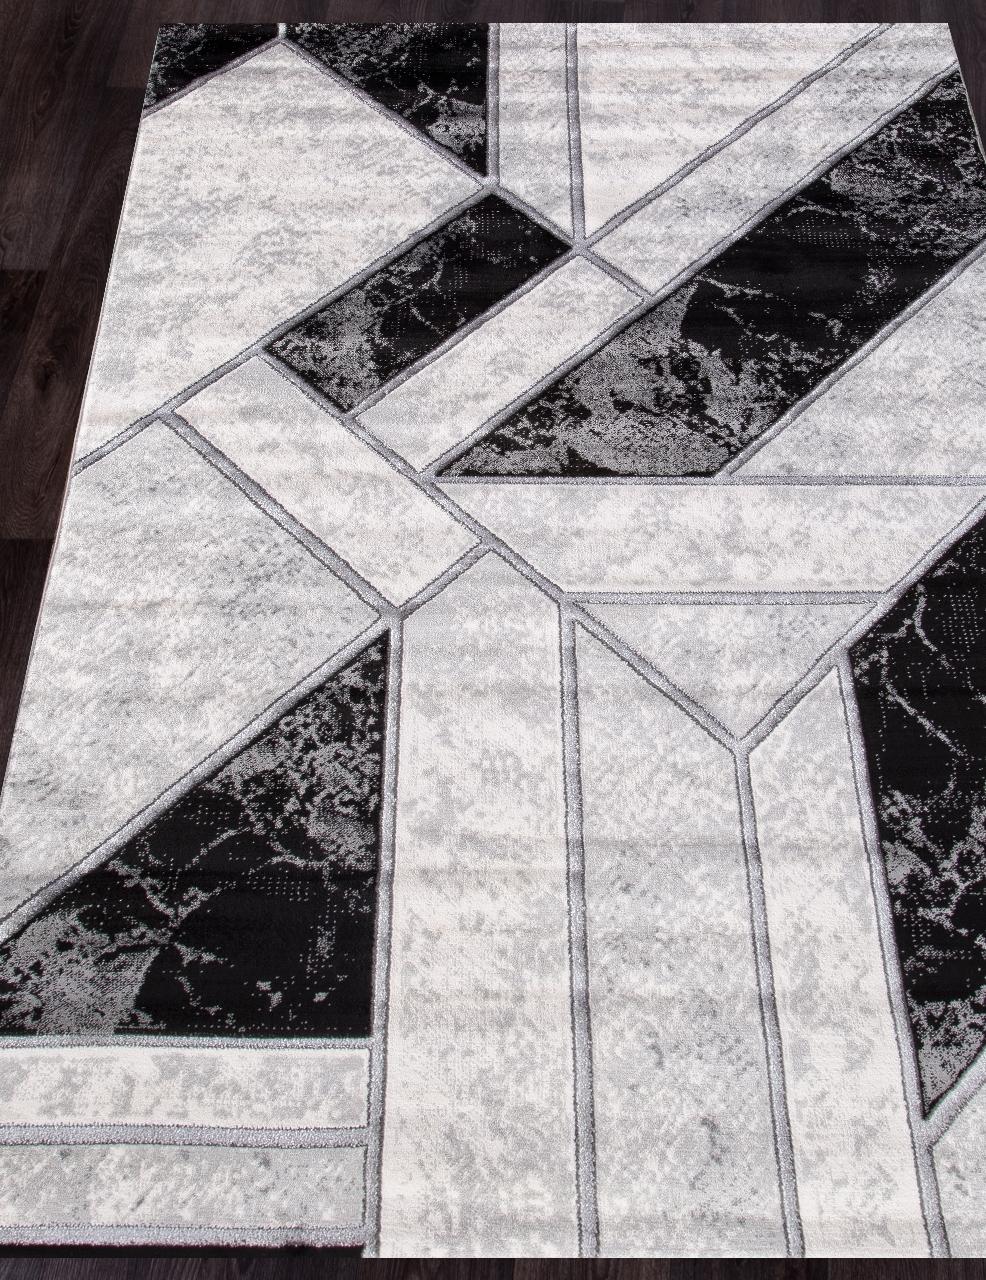 Ковер 04423S - SILVER / SILVER - Прямоугольник - коллекция OMEGA - фото 1